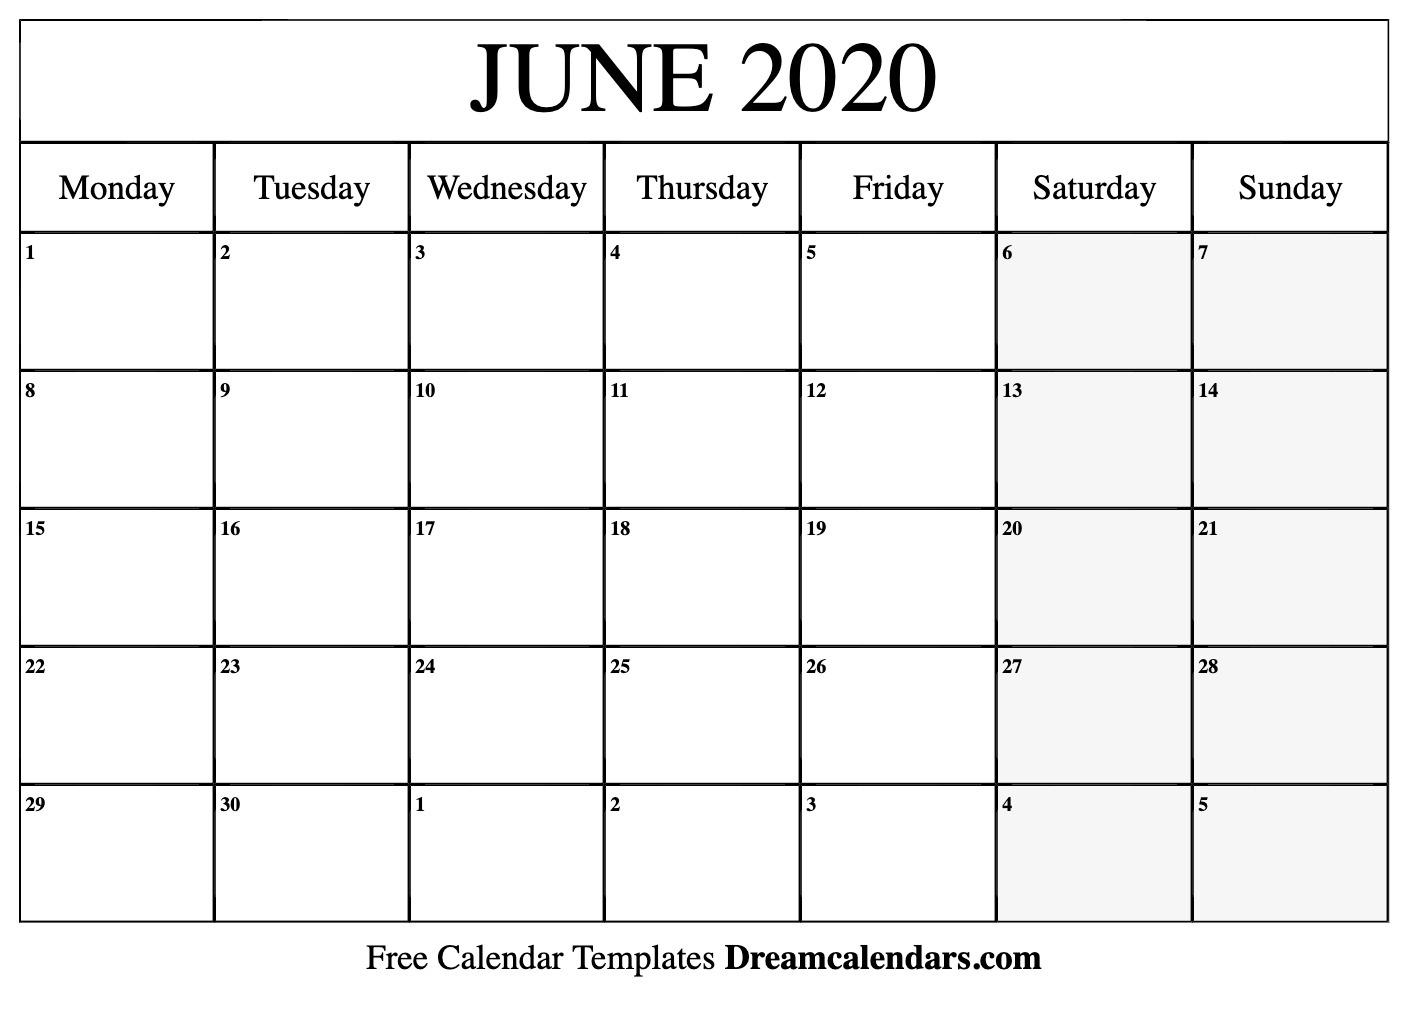 Printable June 2020 Calendar_Calendar Blank June 2020